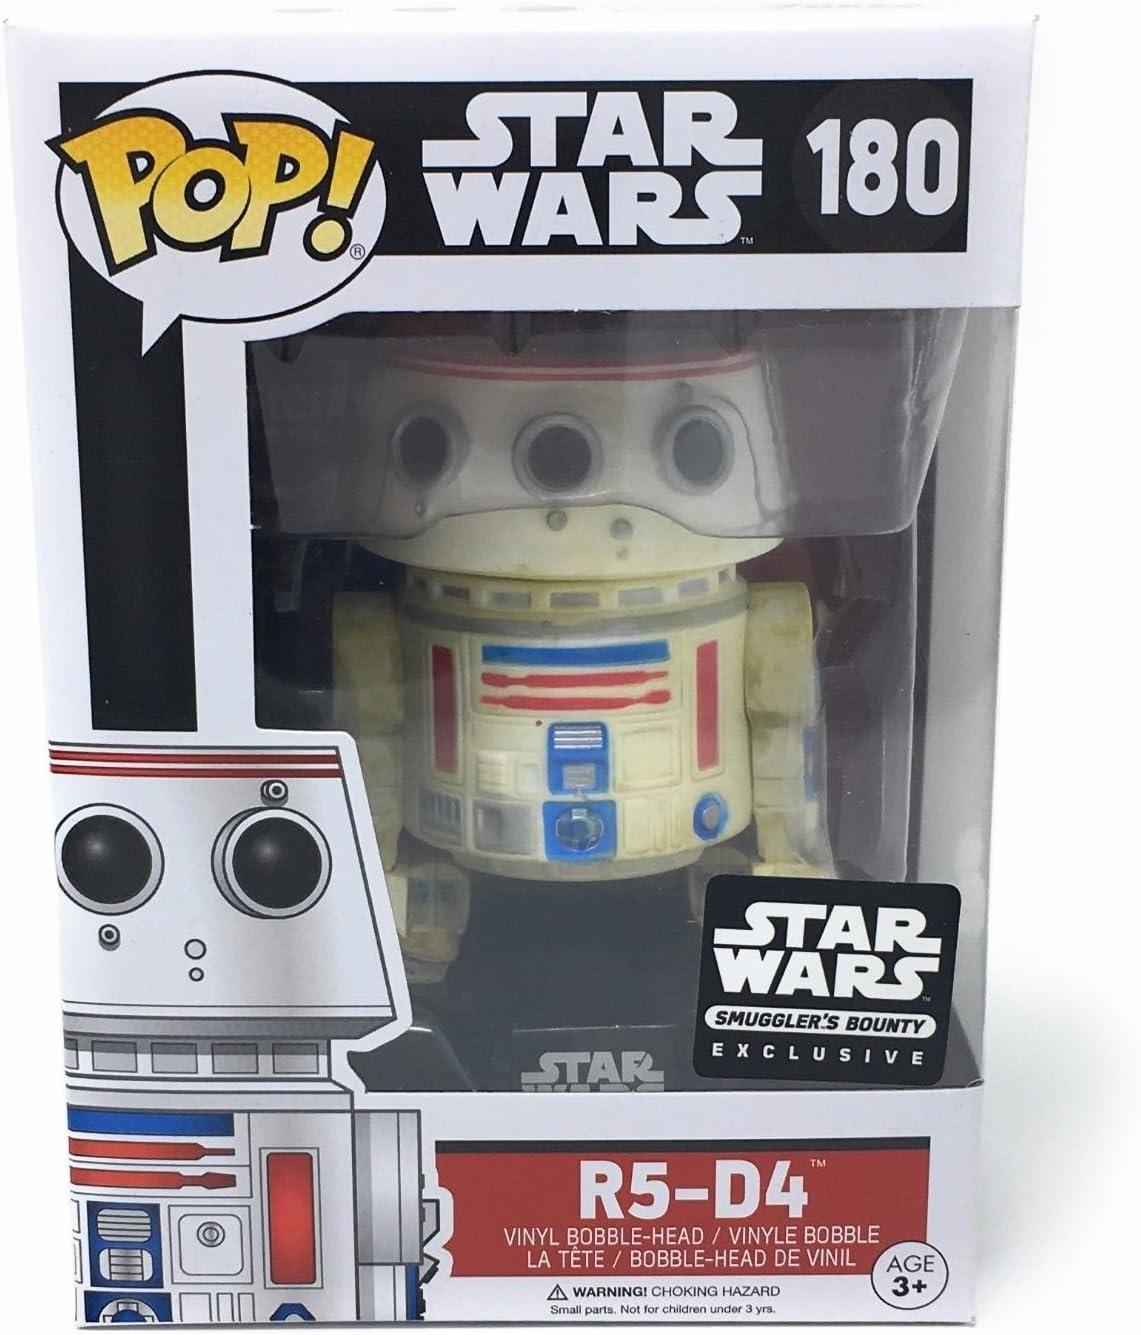 R5-D4 Funko POP! Vinyl Bobble Head Figurine 180 Star Wars Exclusive (In Original Box)